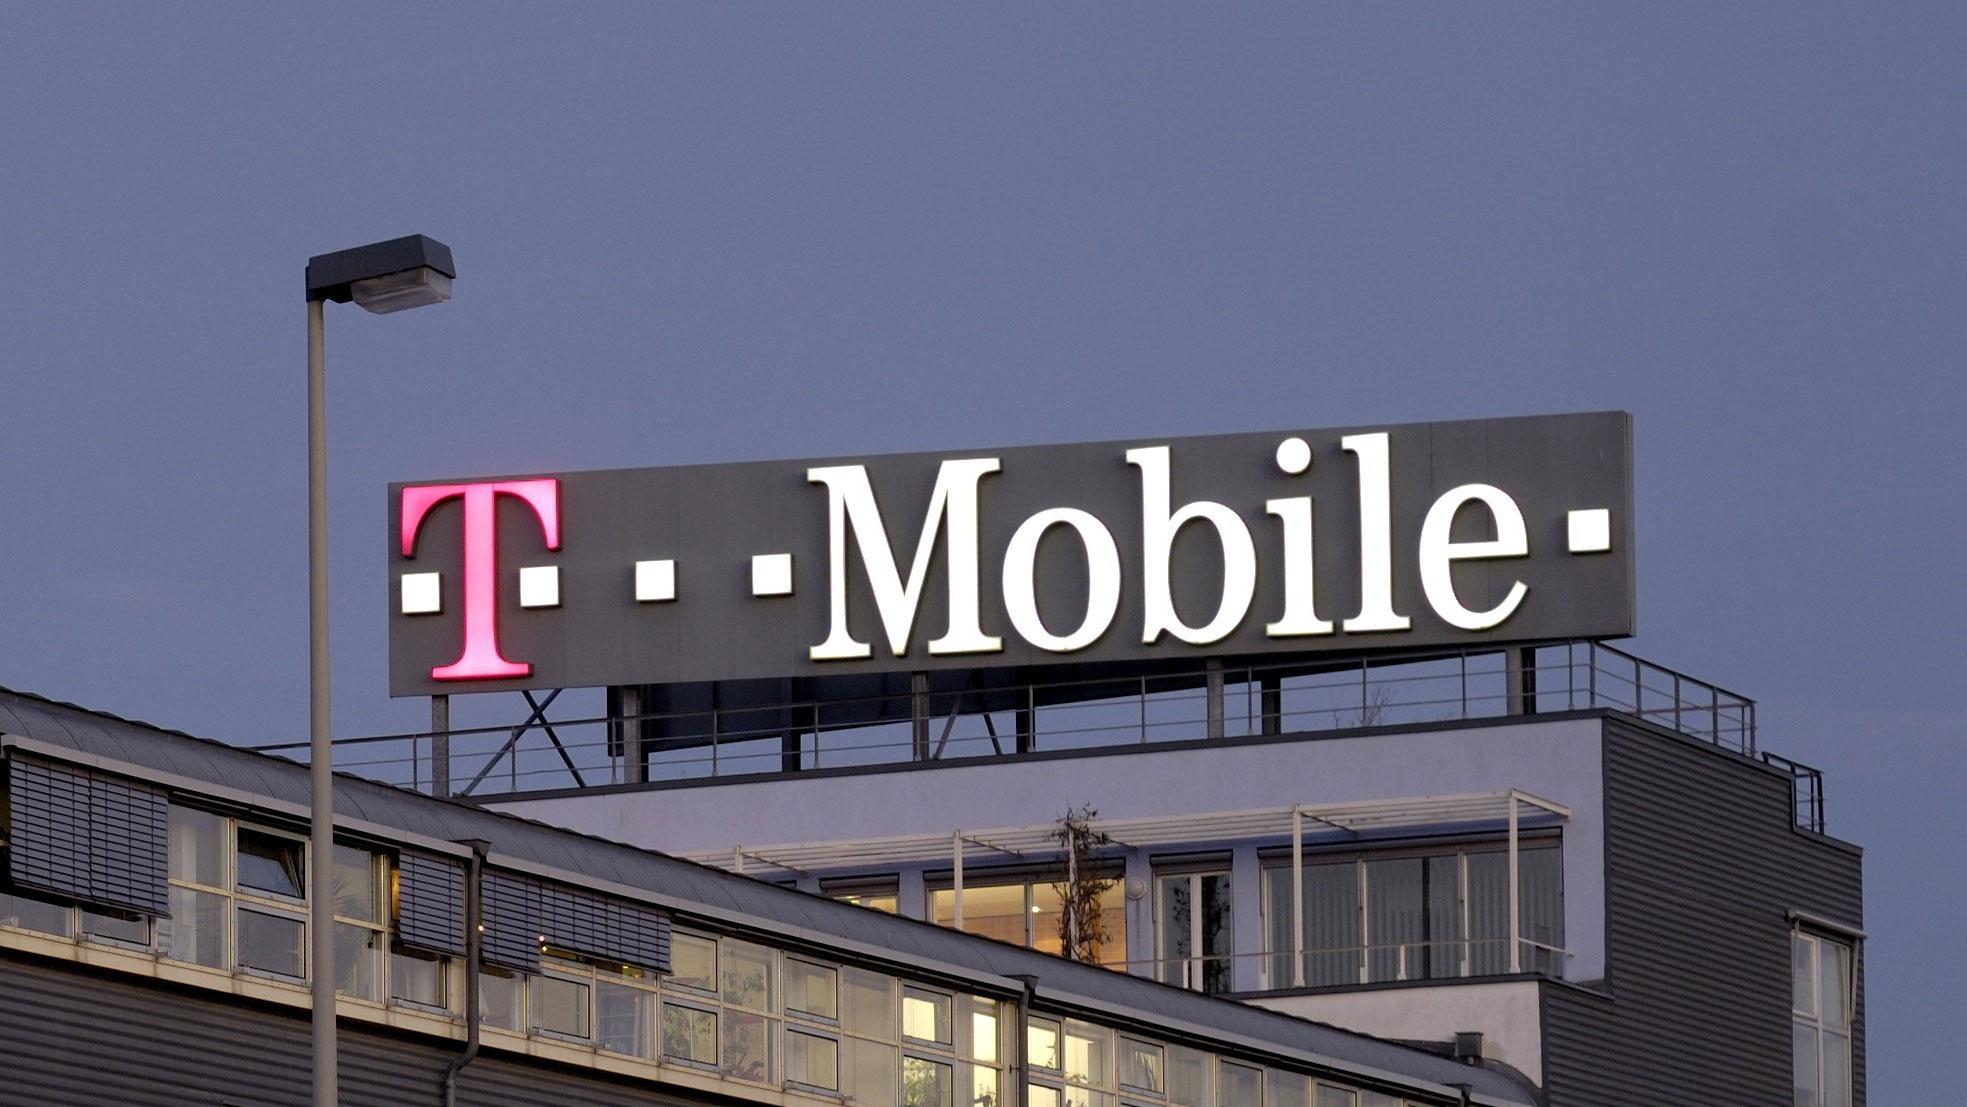 T-Mobile6月15日中午断讯数小时,FCC介入调查